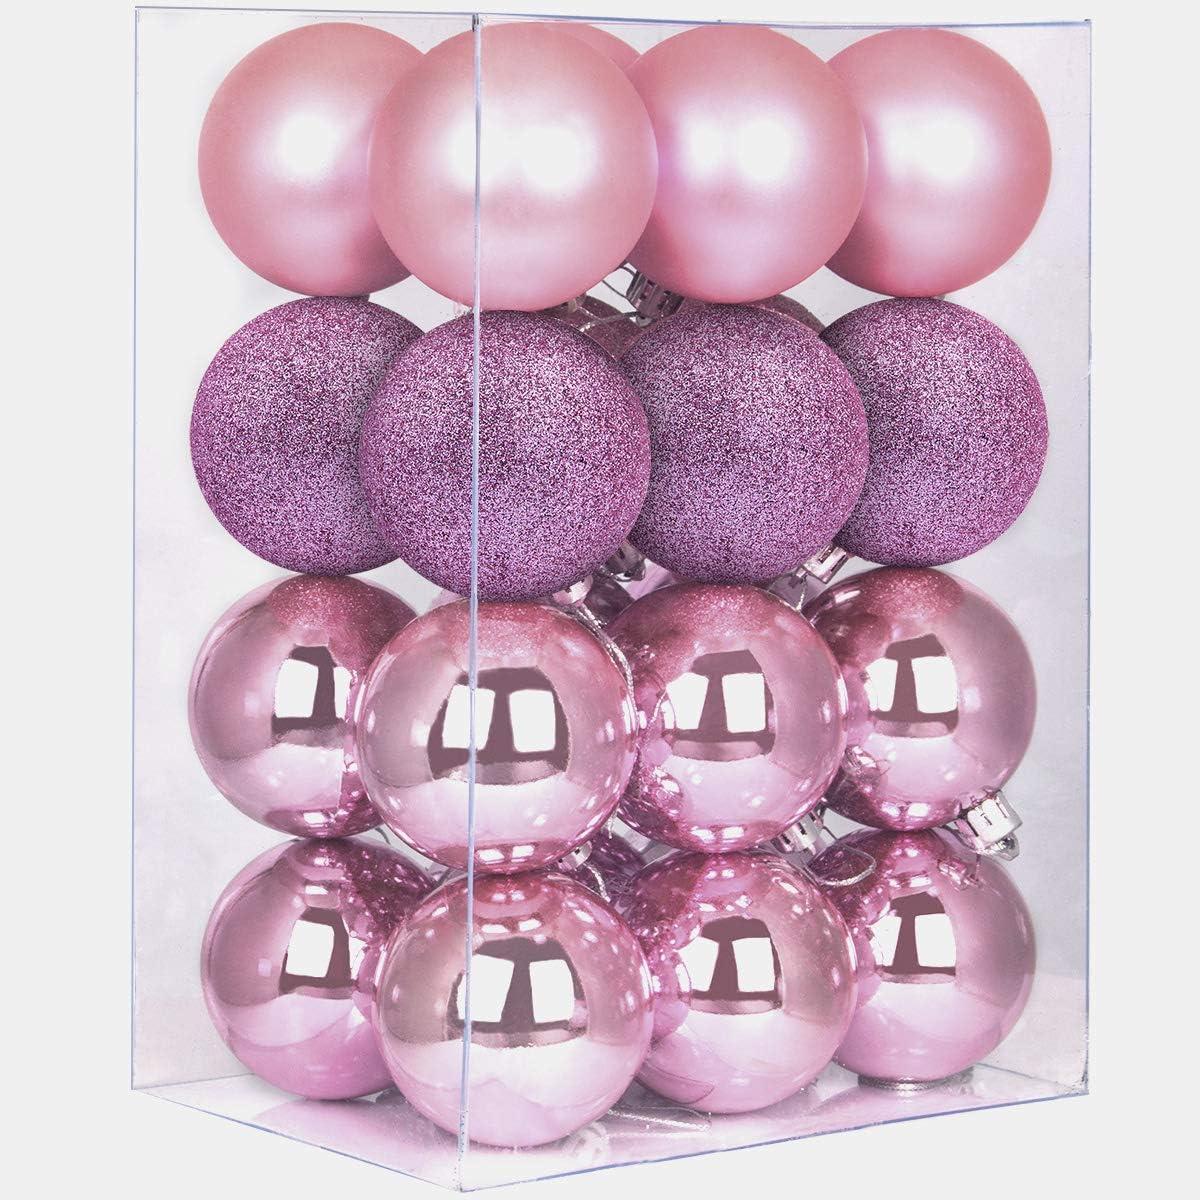 24Pcs Christmas Balls Ornaments for Xmas Tree - Shatterproof Christmas Tree Decorations Large Hanging Ball Lavender Purple 3.2